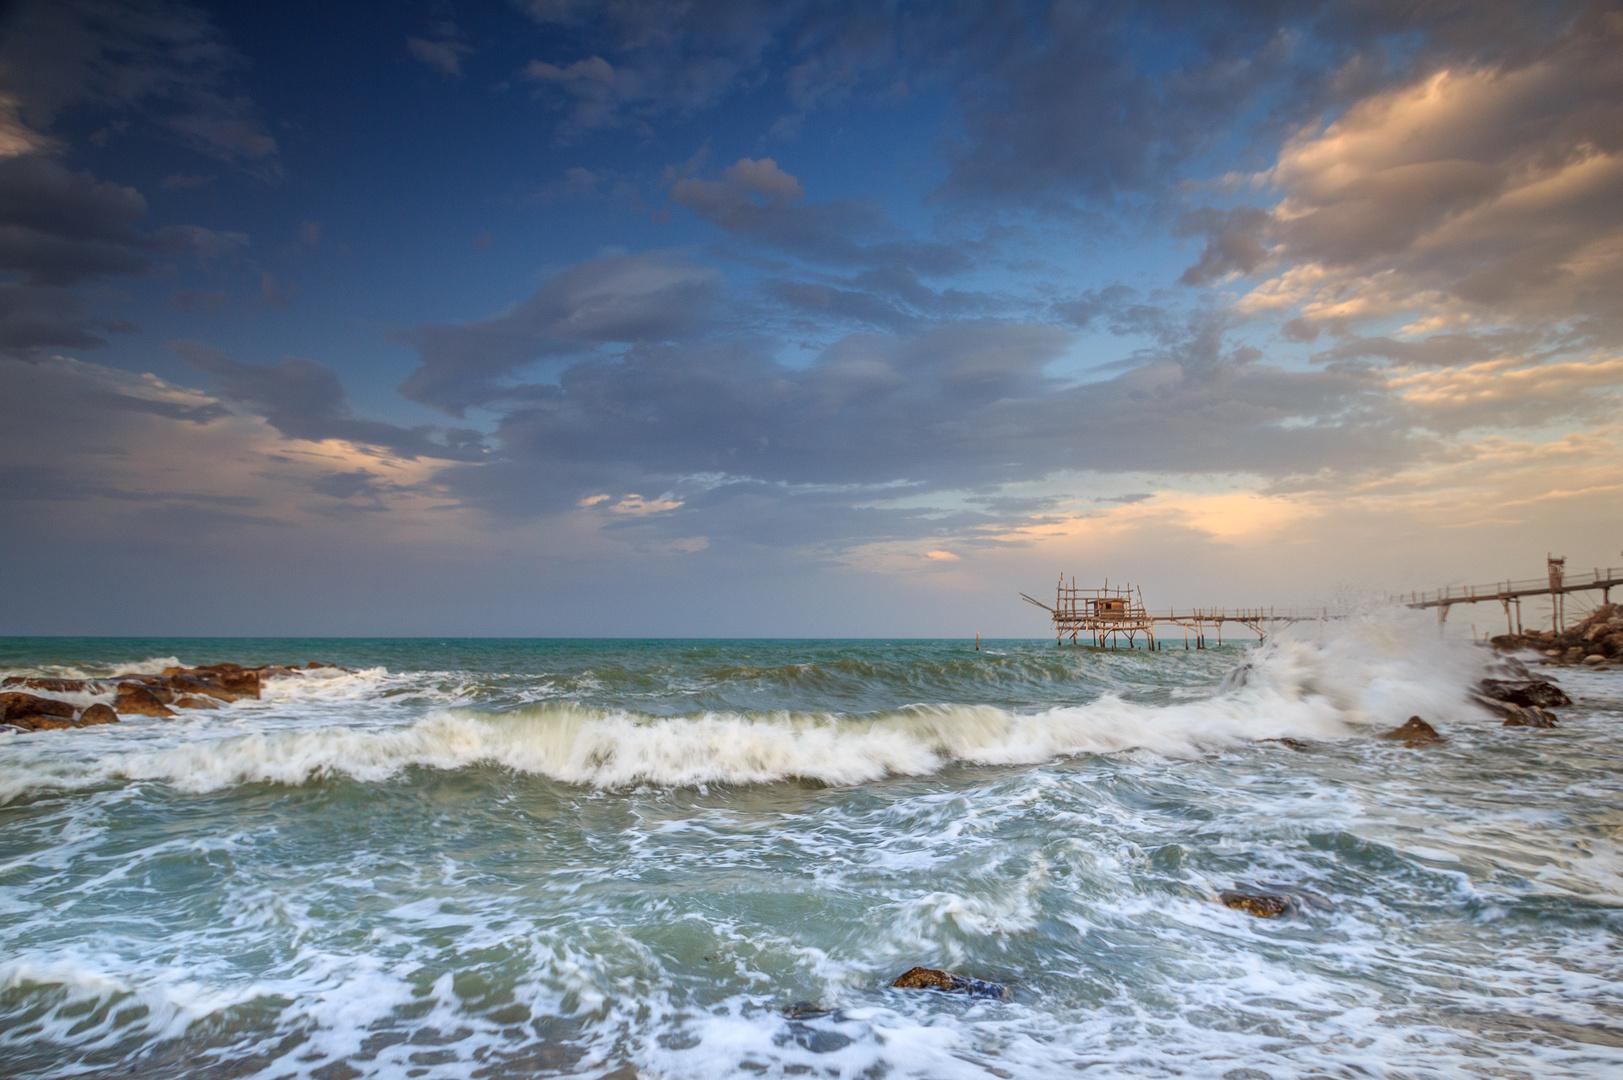 Sea storm Trabocco Turchino